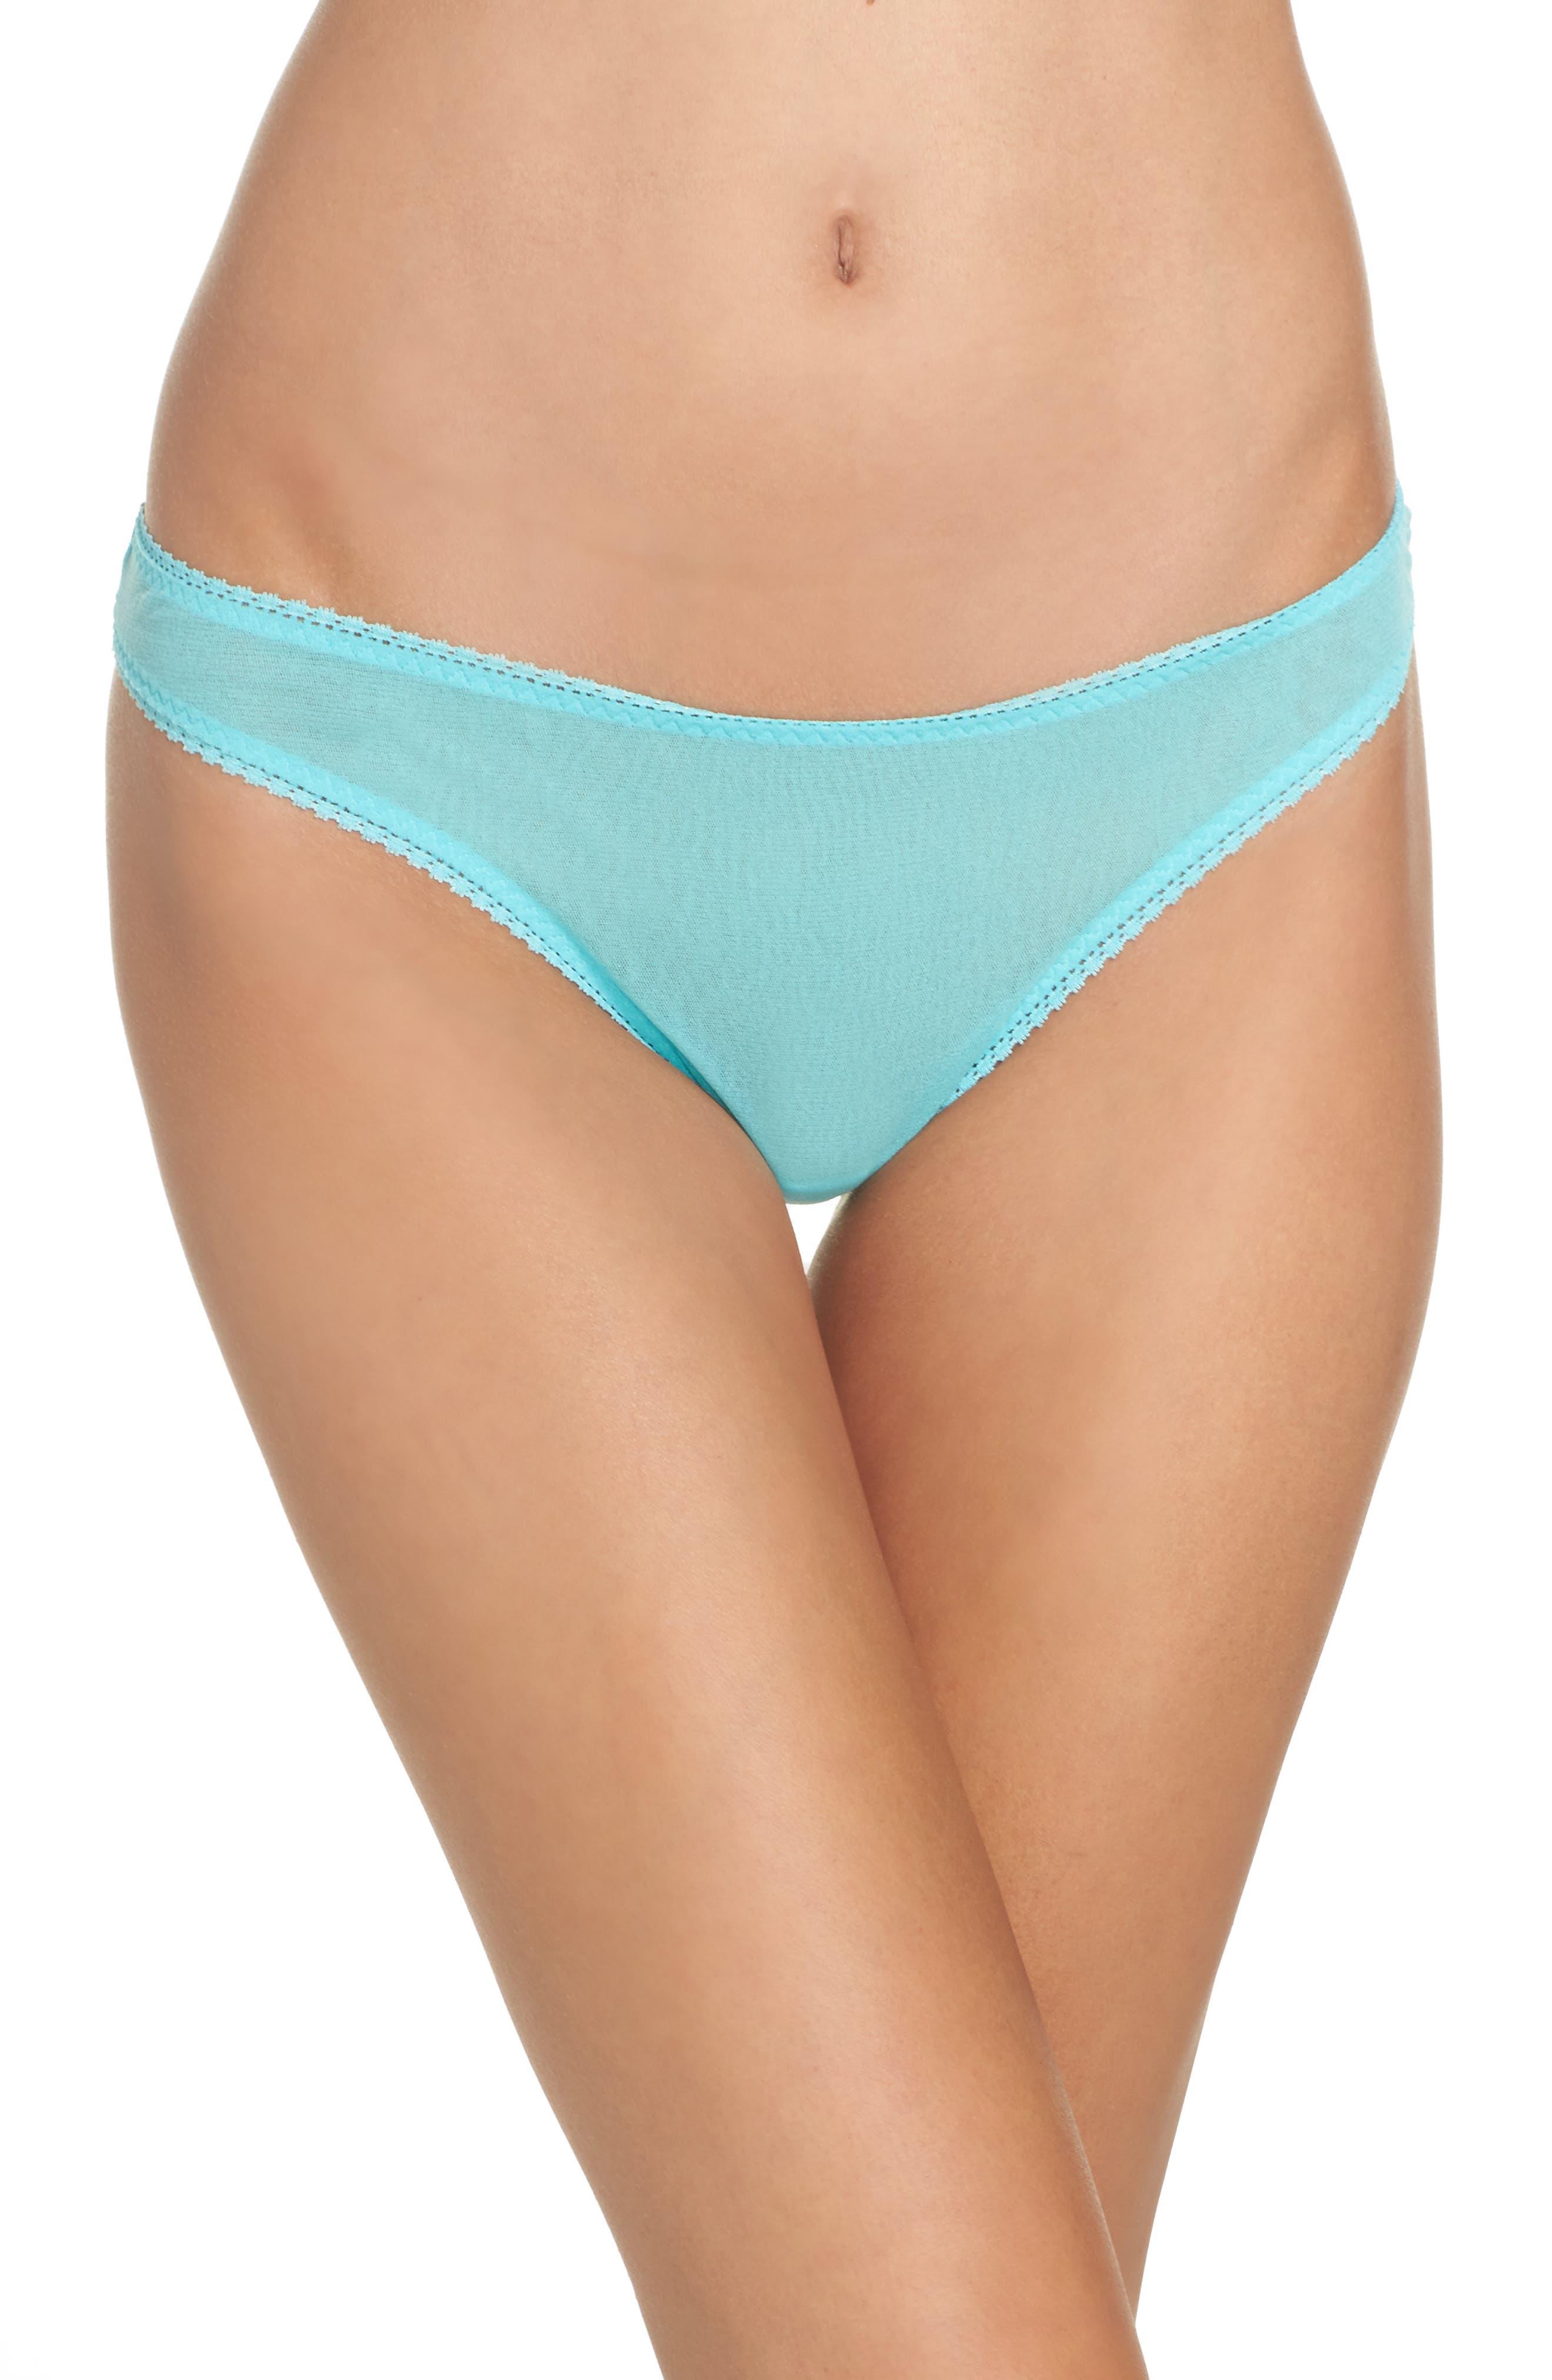 'Hip-G' Mesh Thong,                         Main,                         color, Blue Radiance